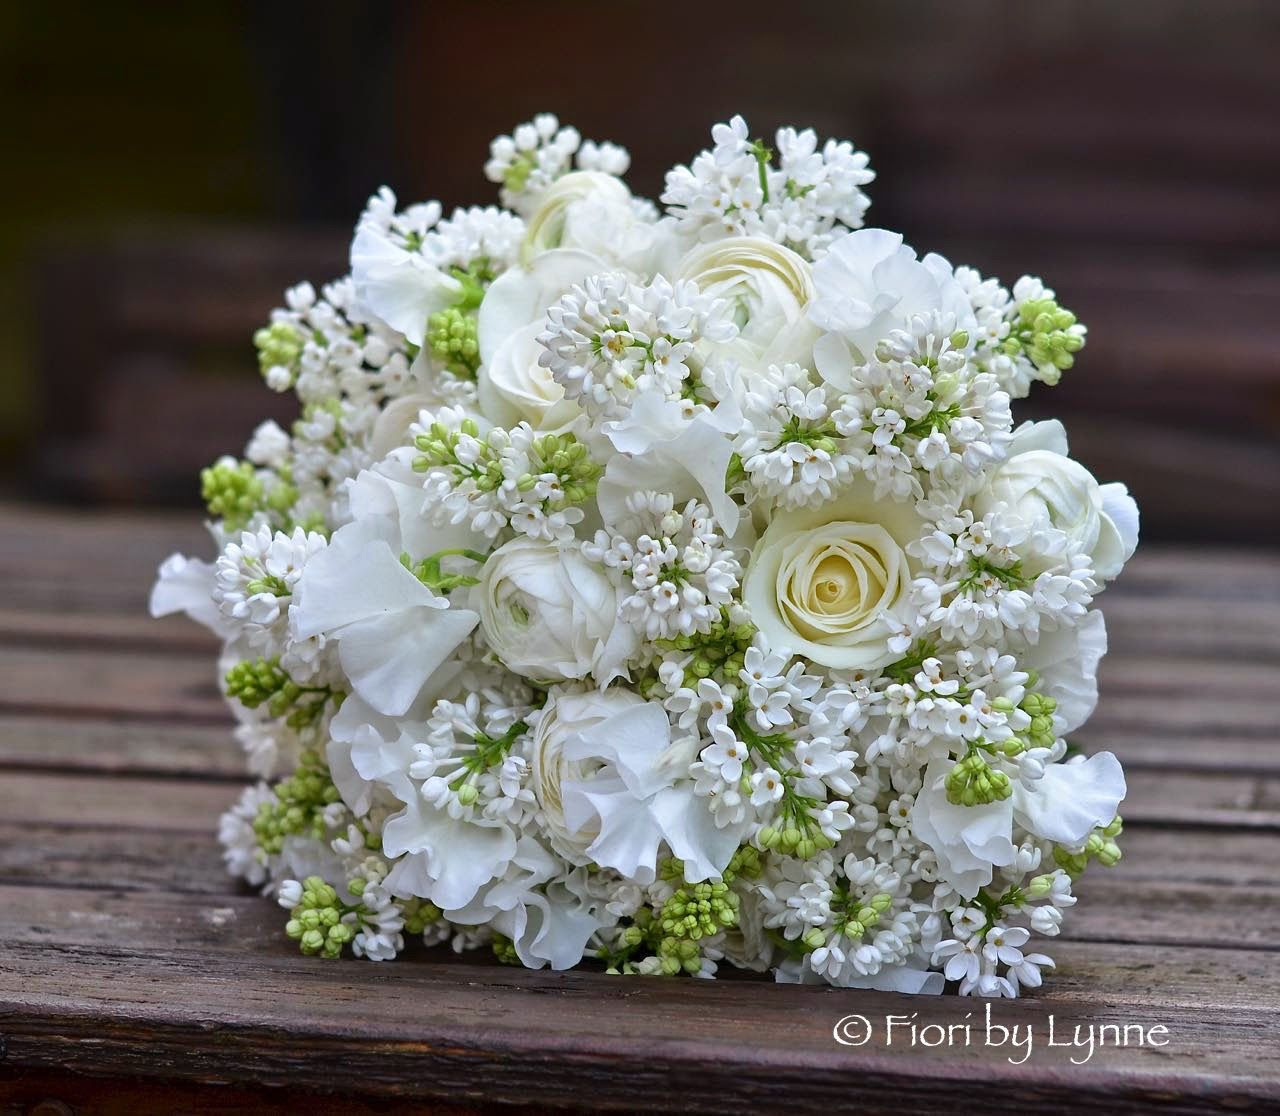 White Lilacs Syringa Ranunculus White Sweet Pea Flowers